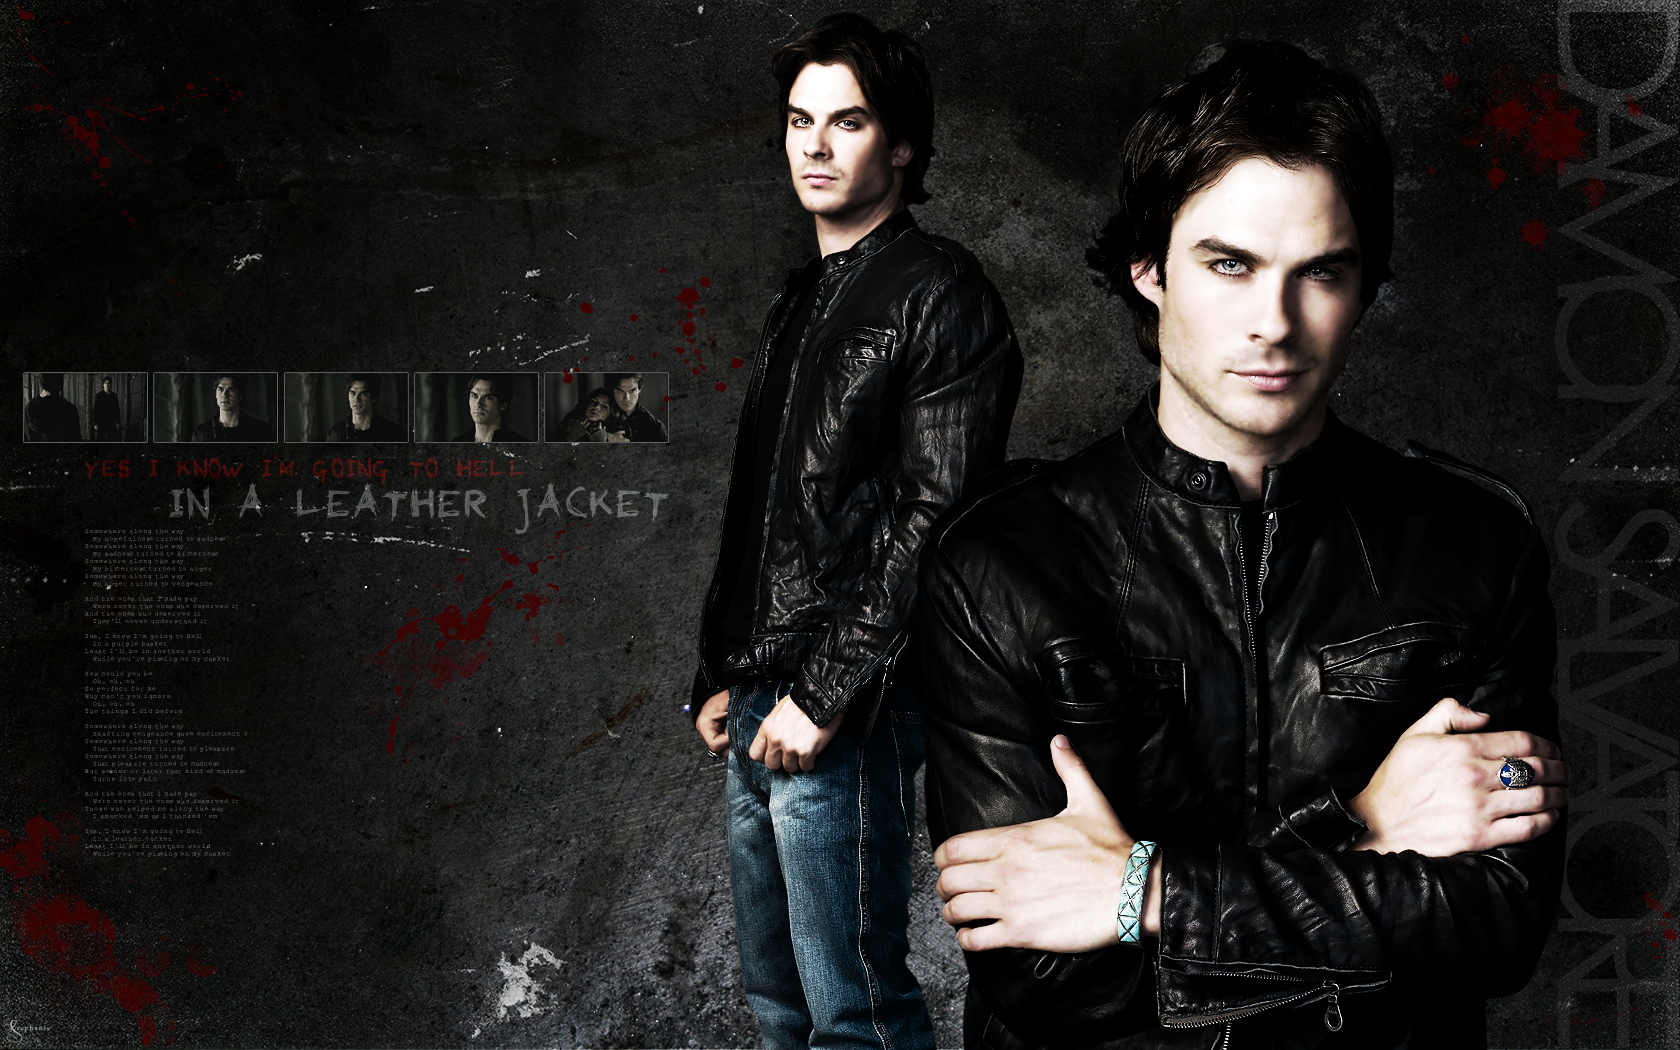 Damon   The Vampire Diaries Wallpaper 12233973 1680x1050